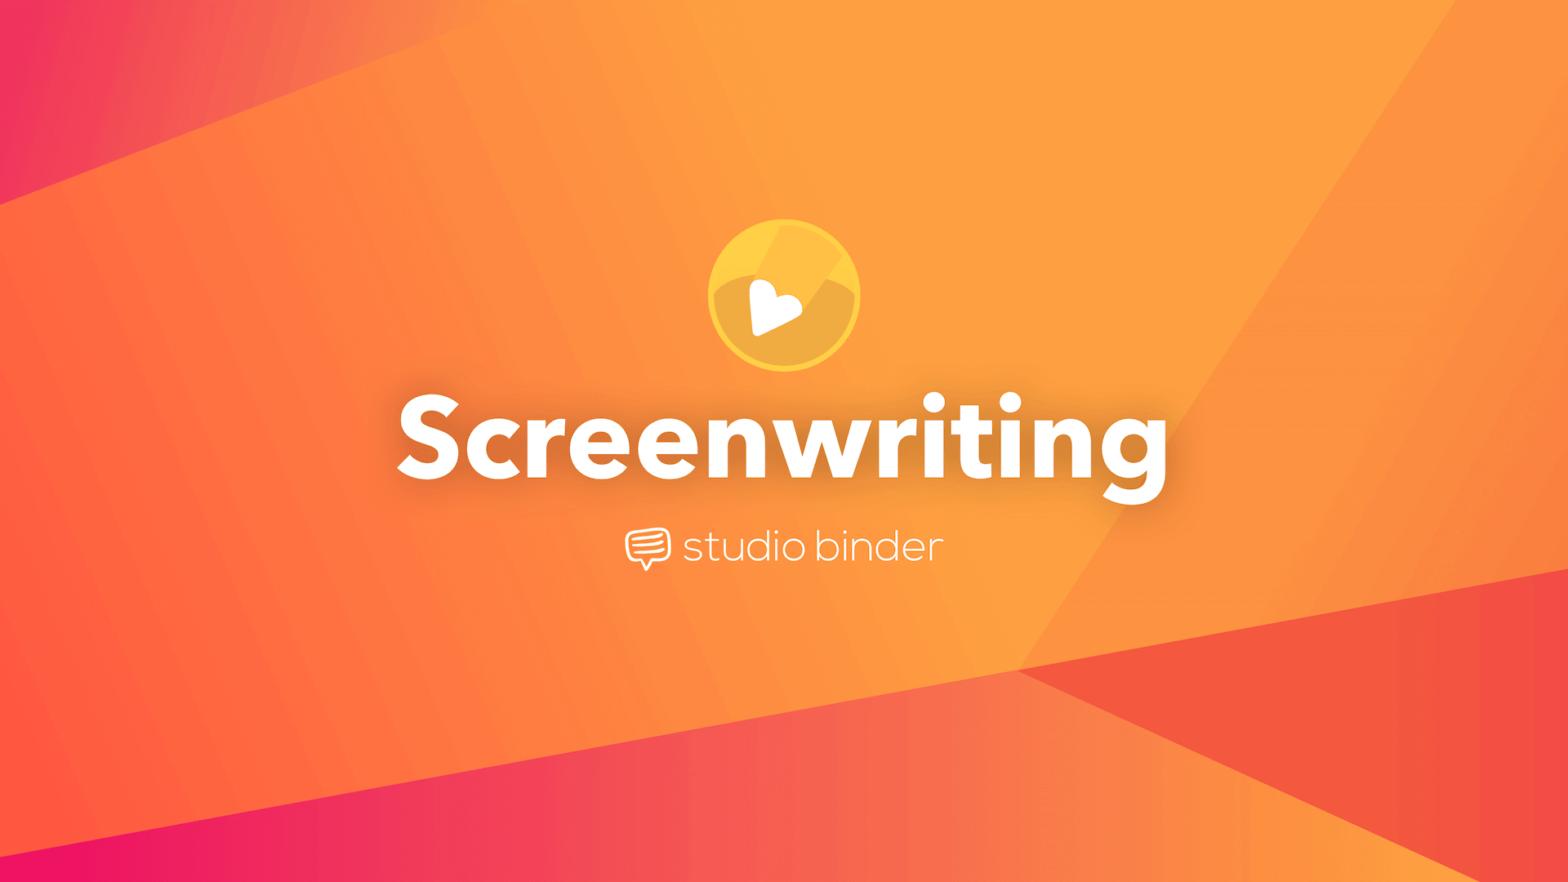 Free Screenwriting Software Featured Image StudioBinder